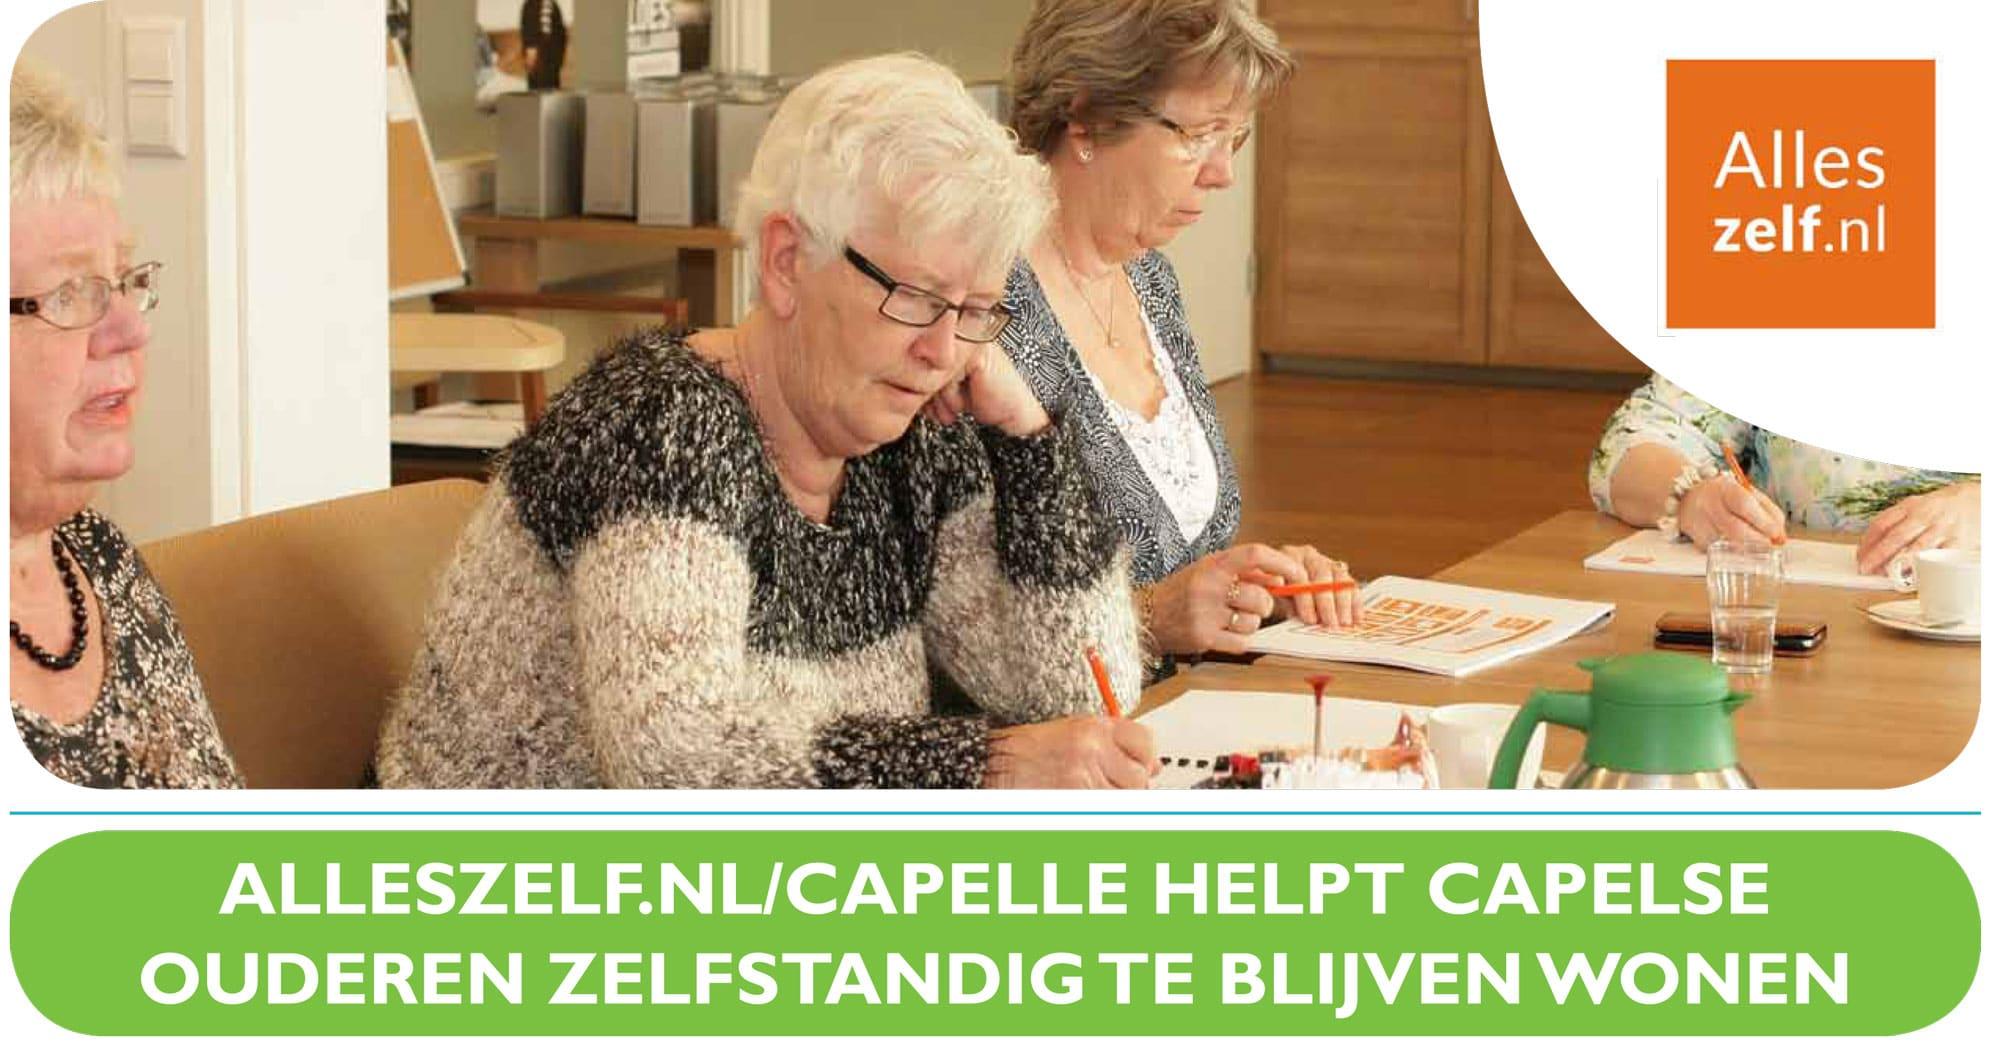 hulp en ondersteuning capelle